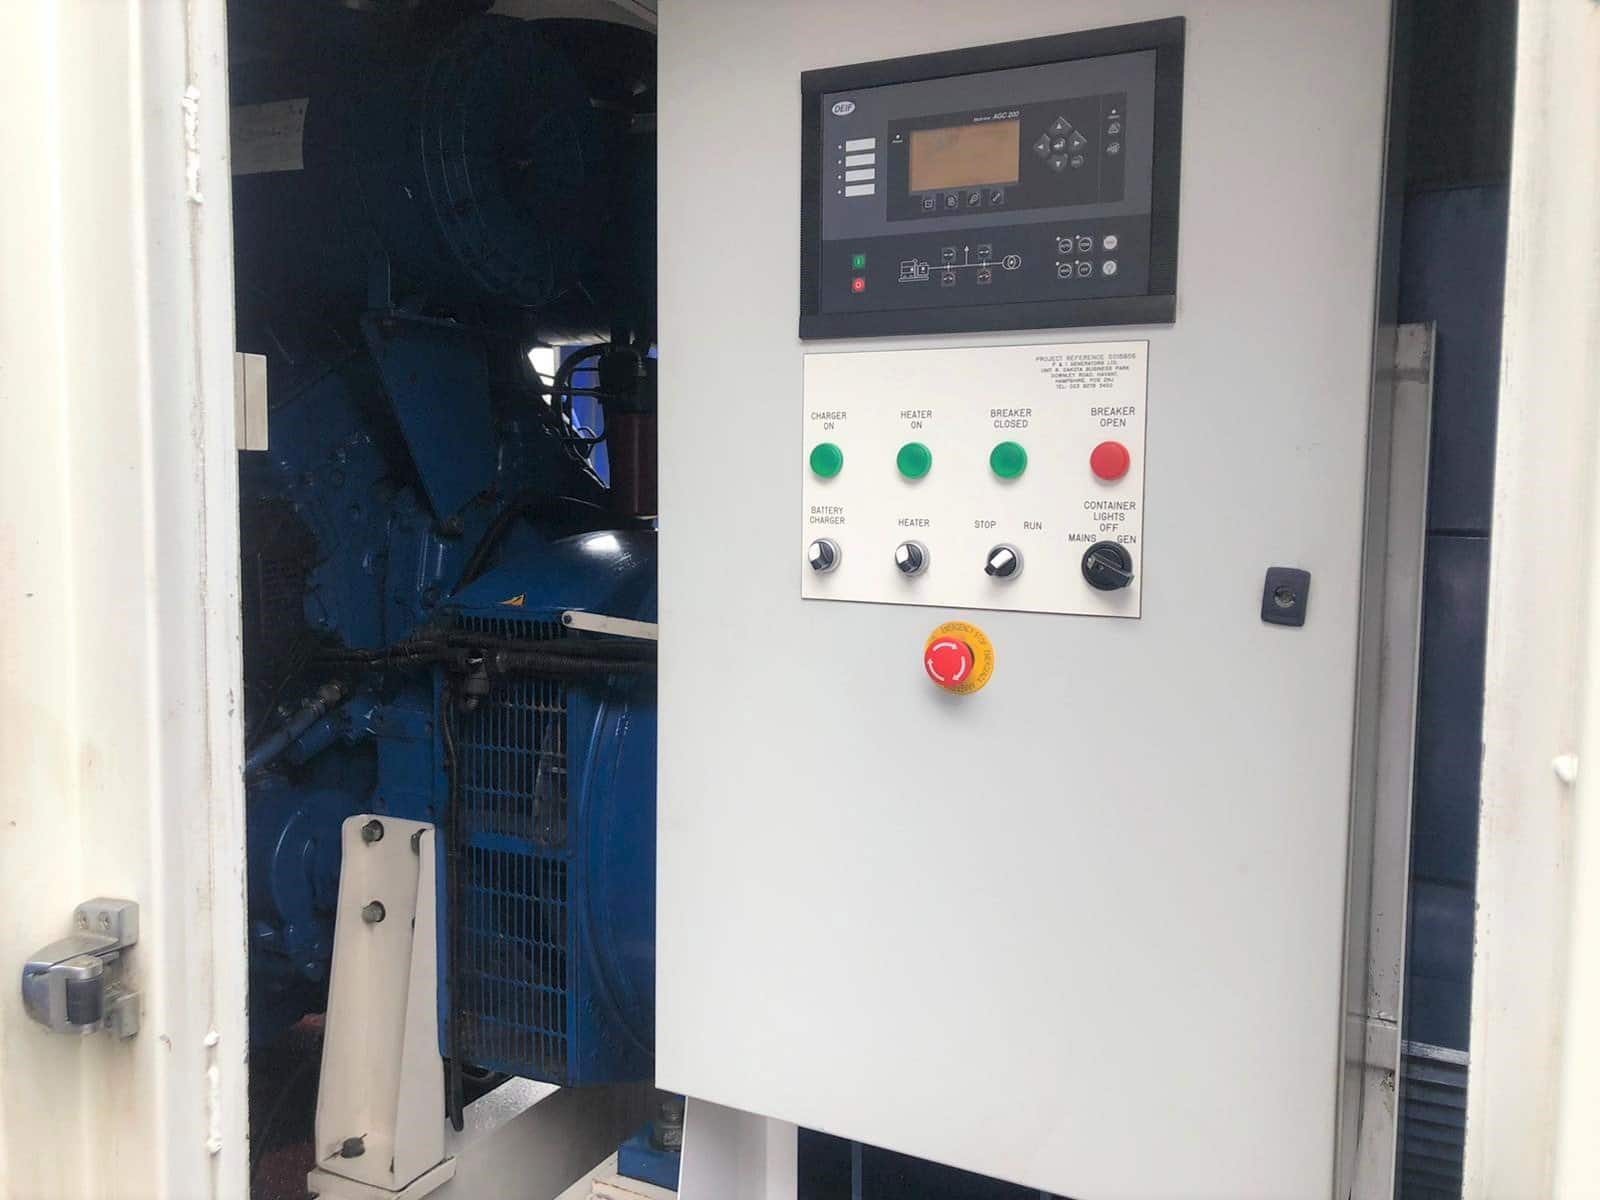 800 FG Wilson, Perkins/Stamford Generator control panel